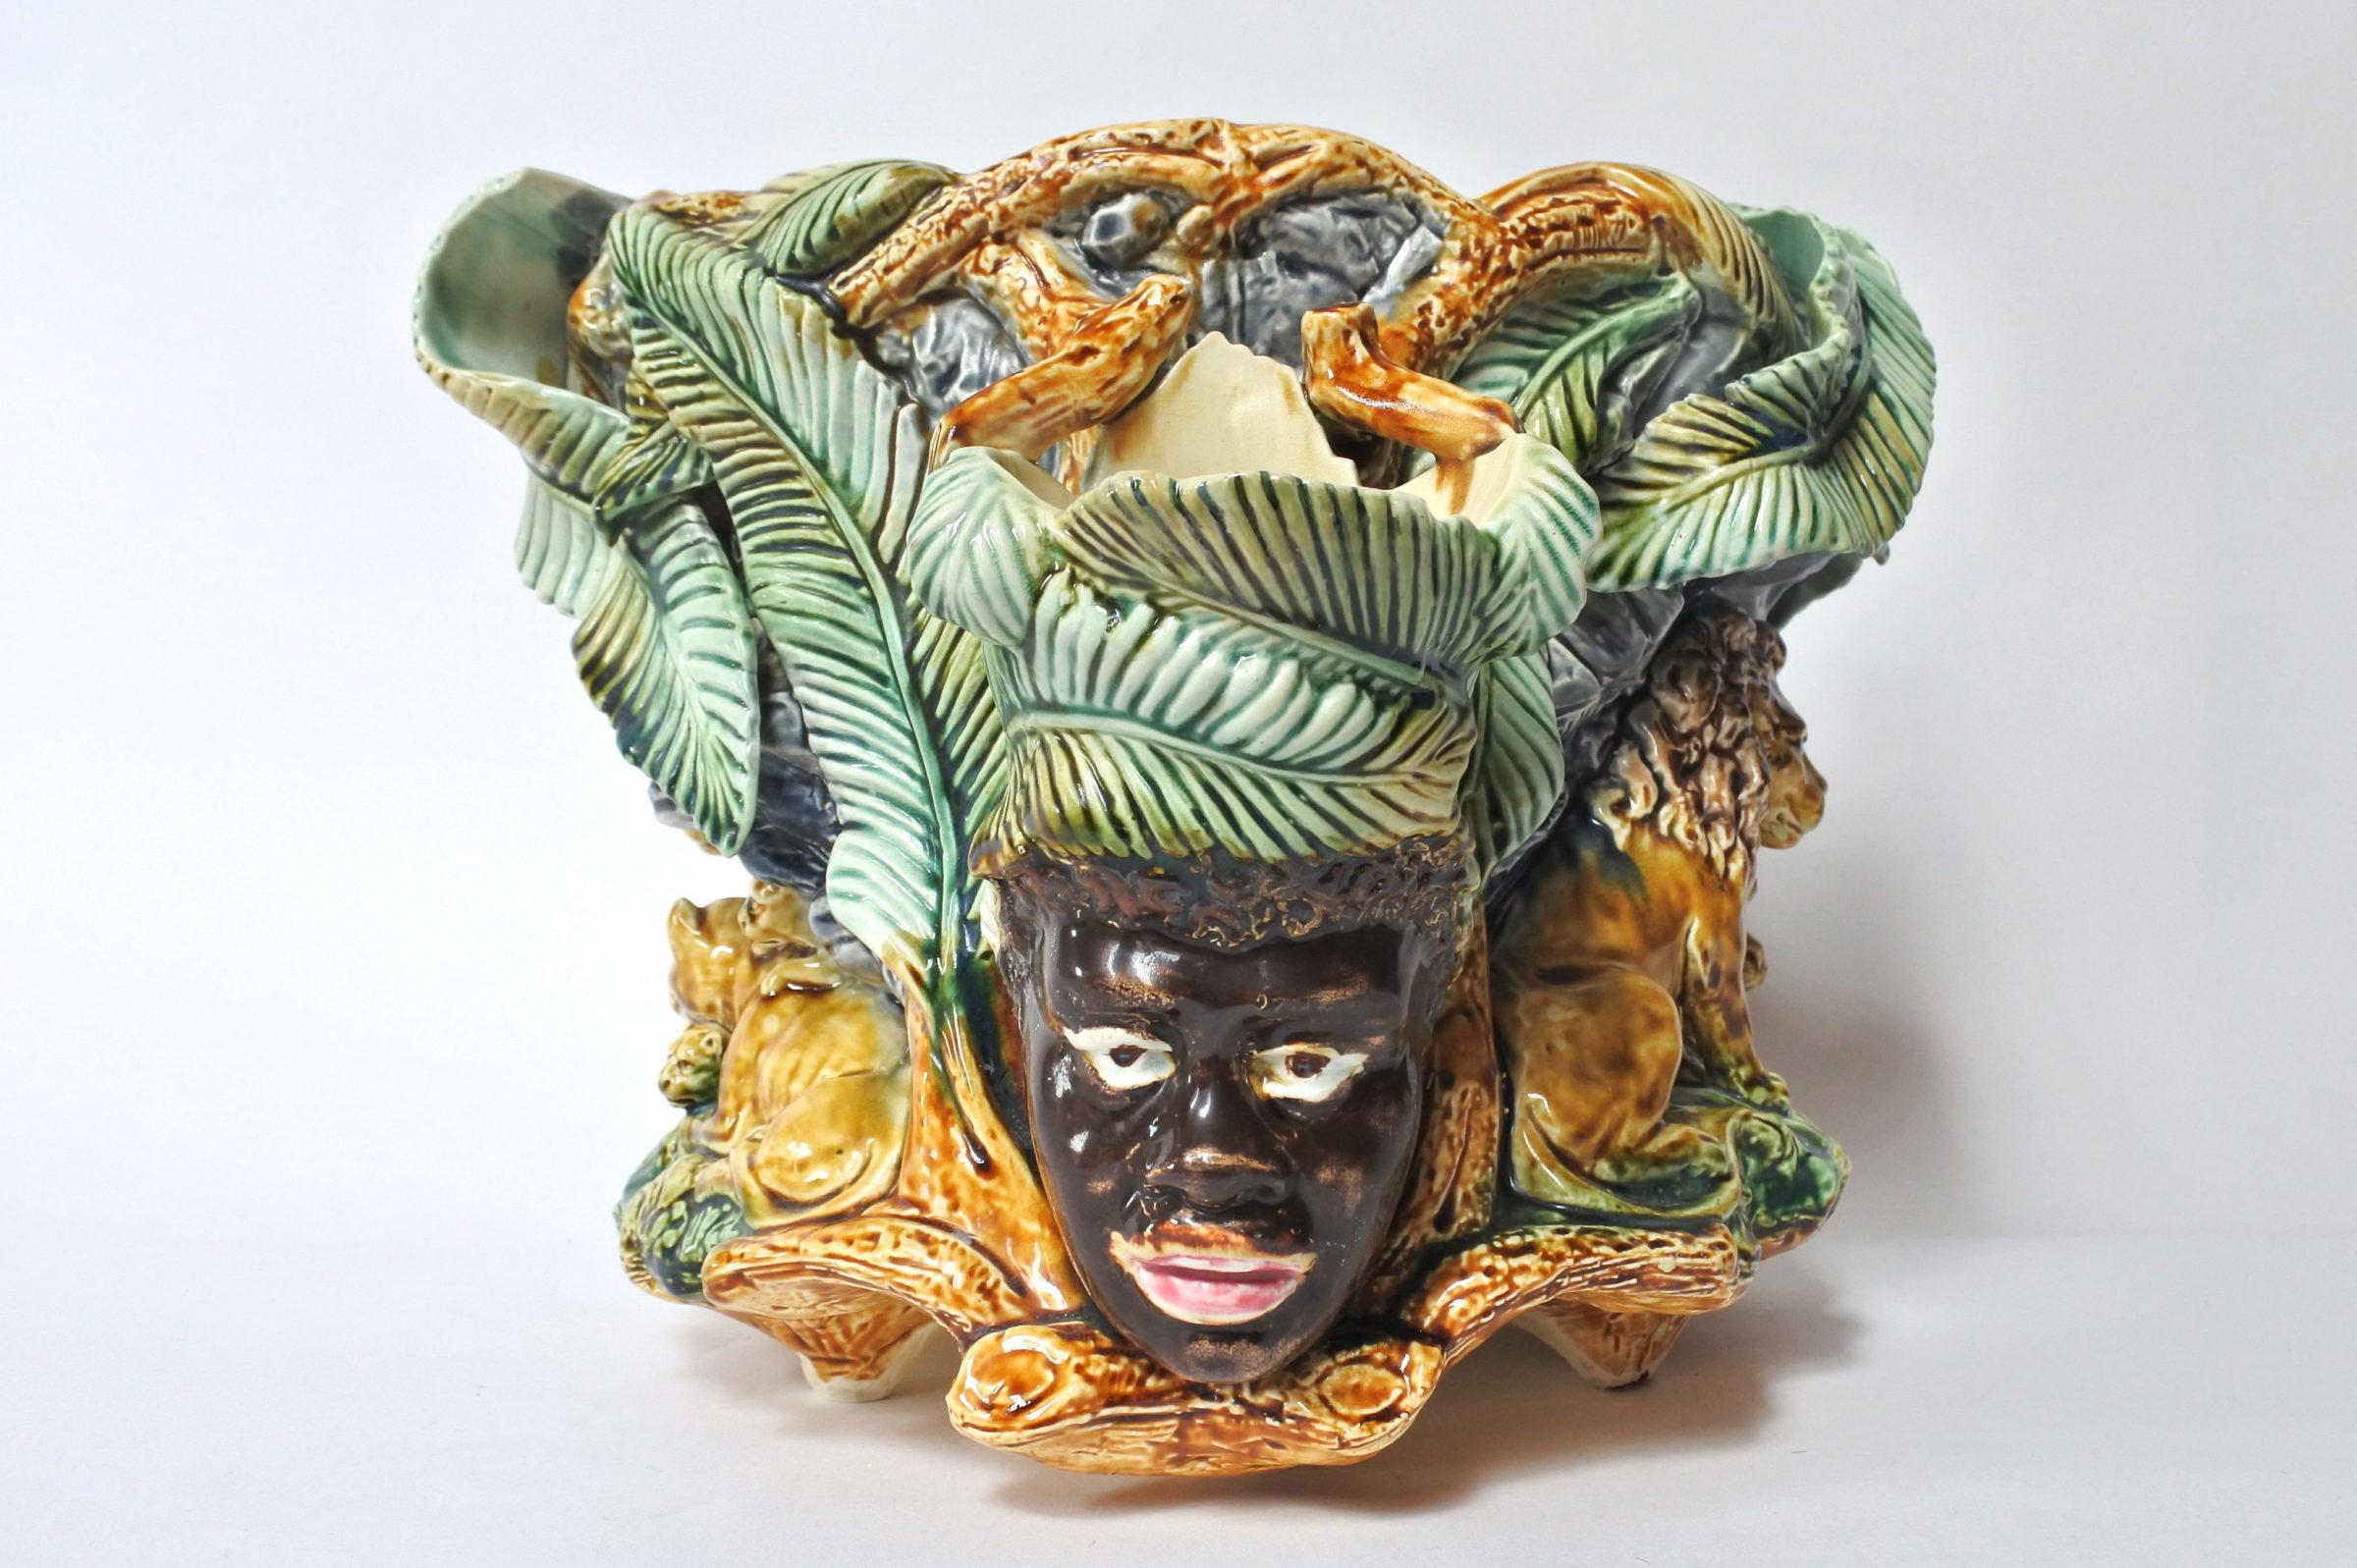 Centrotavola in ceramica barbotine con funzione di jardinière - Onnaing - 7